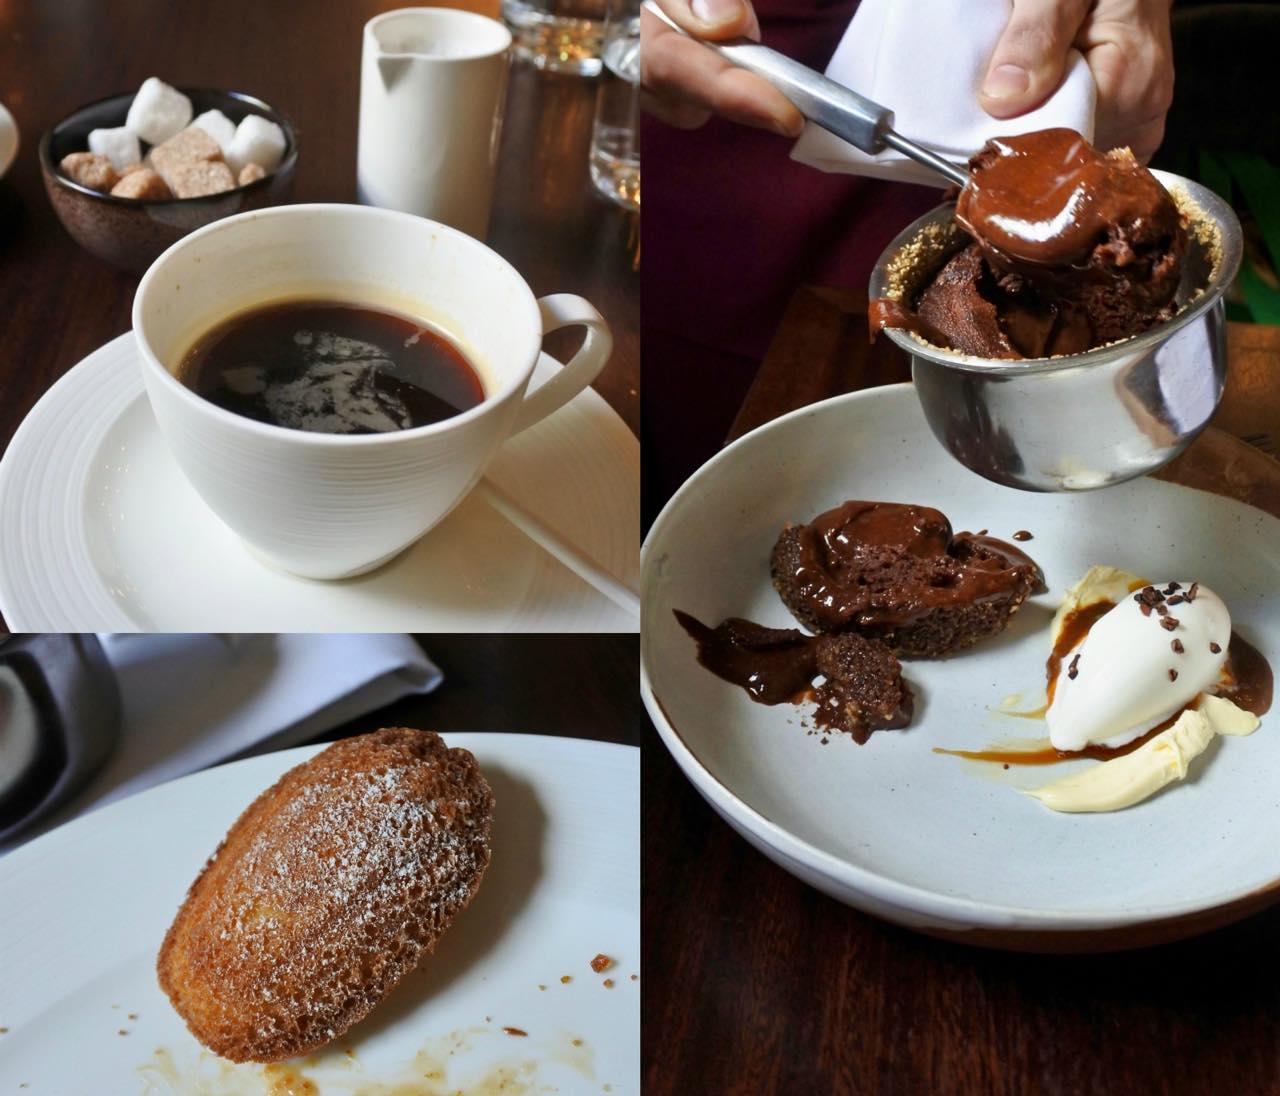 Chocolate cake, pecan praline, salted caramel sauce, mascarpone ice cream